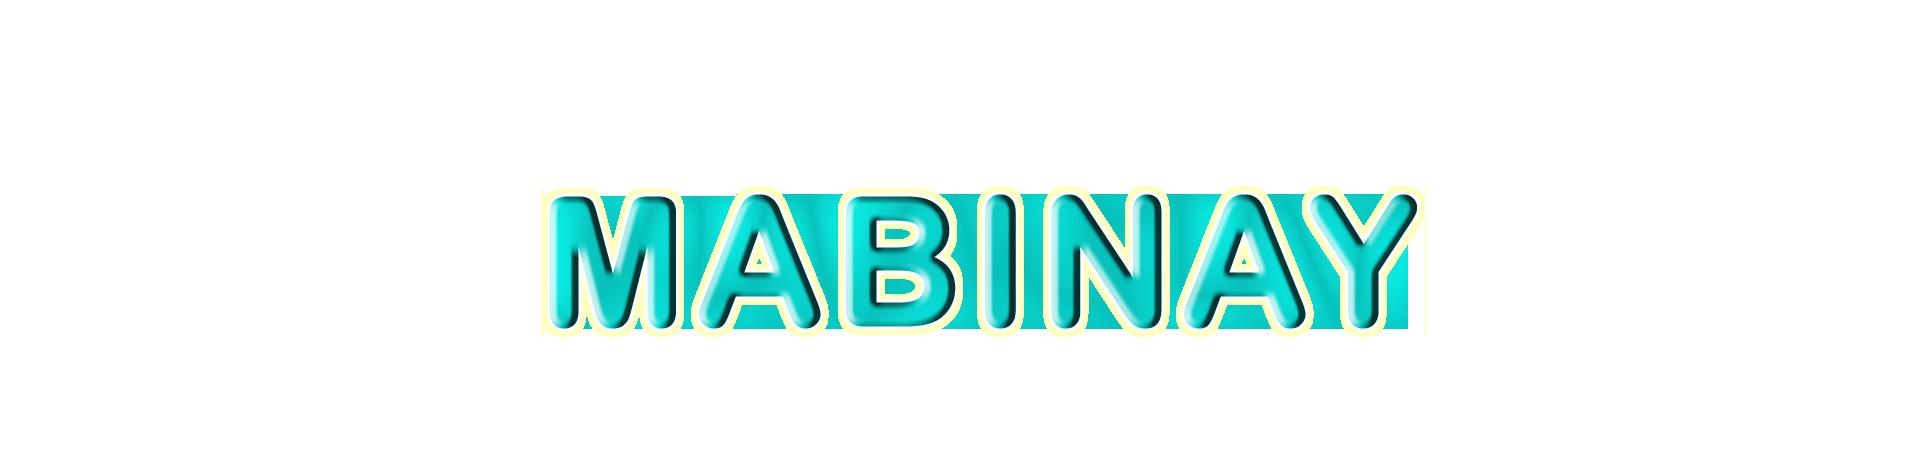 Mabinay-Negros Oriental